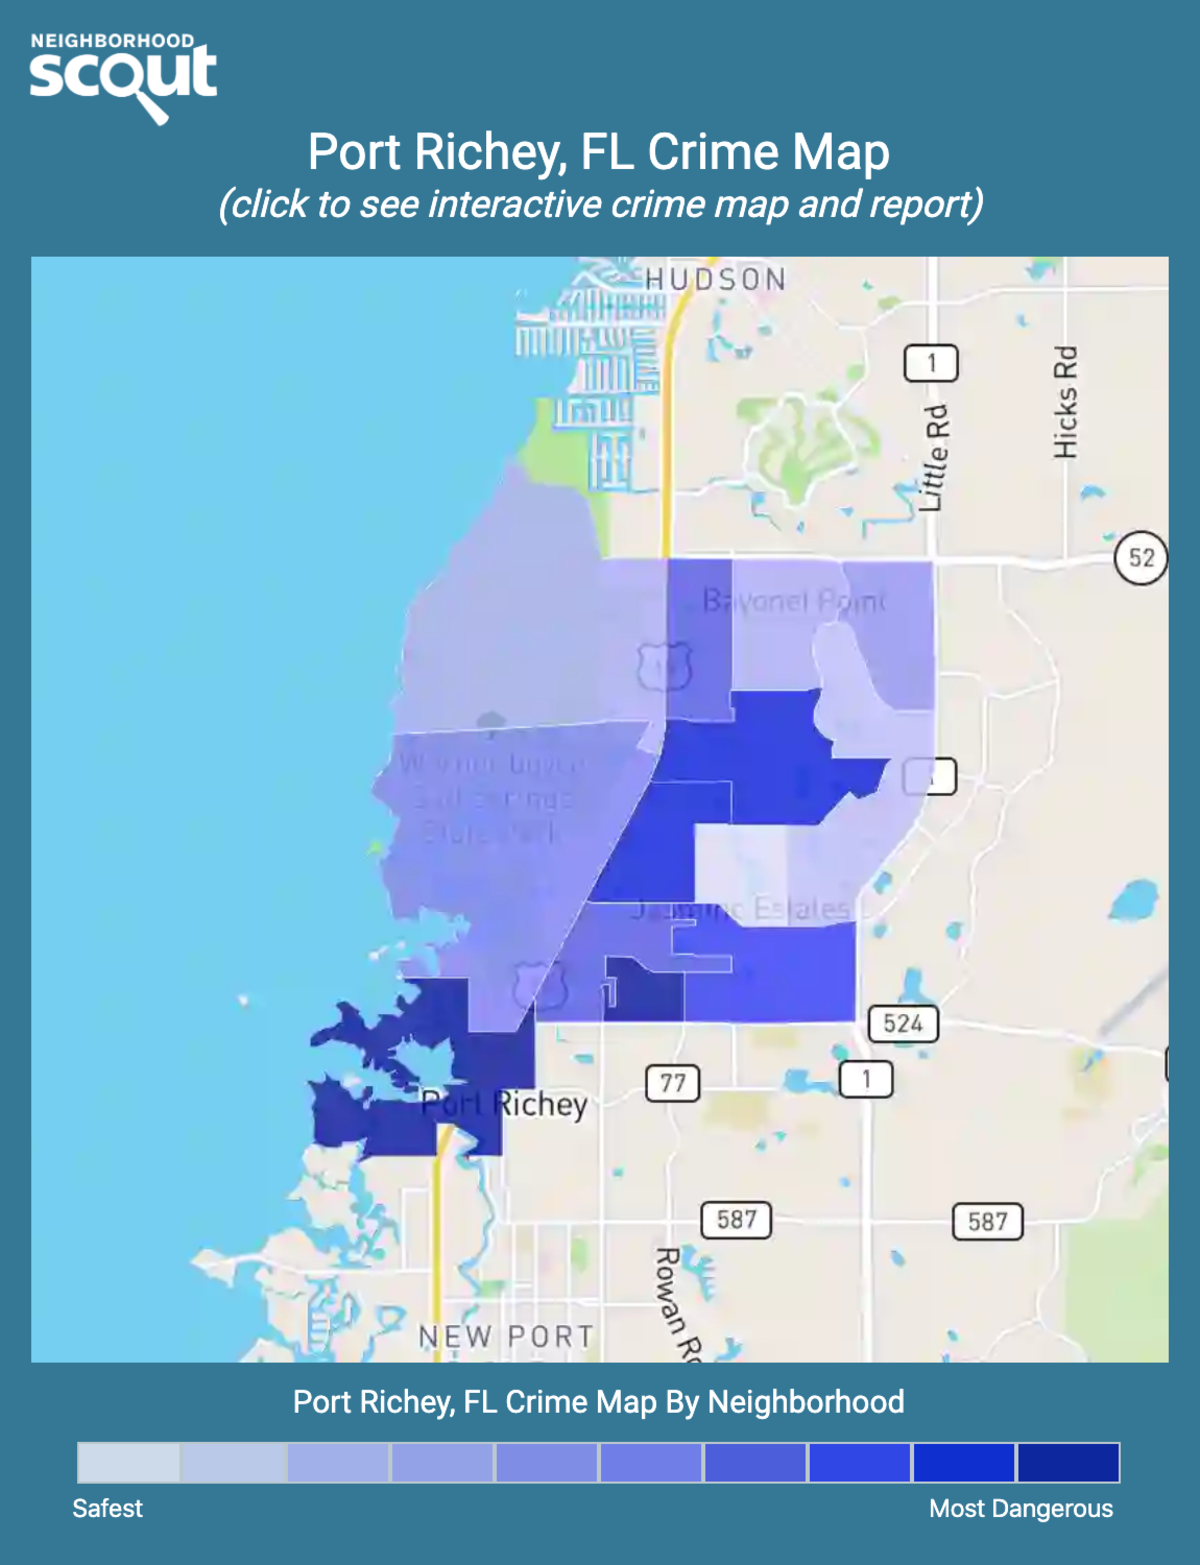 Port Richey, Florida crime map